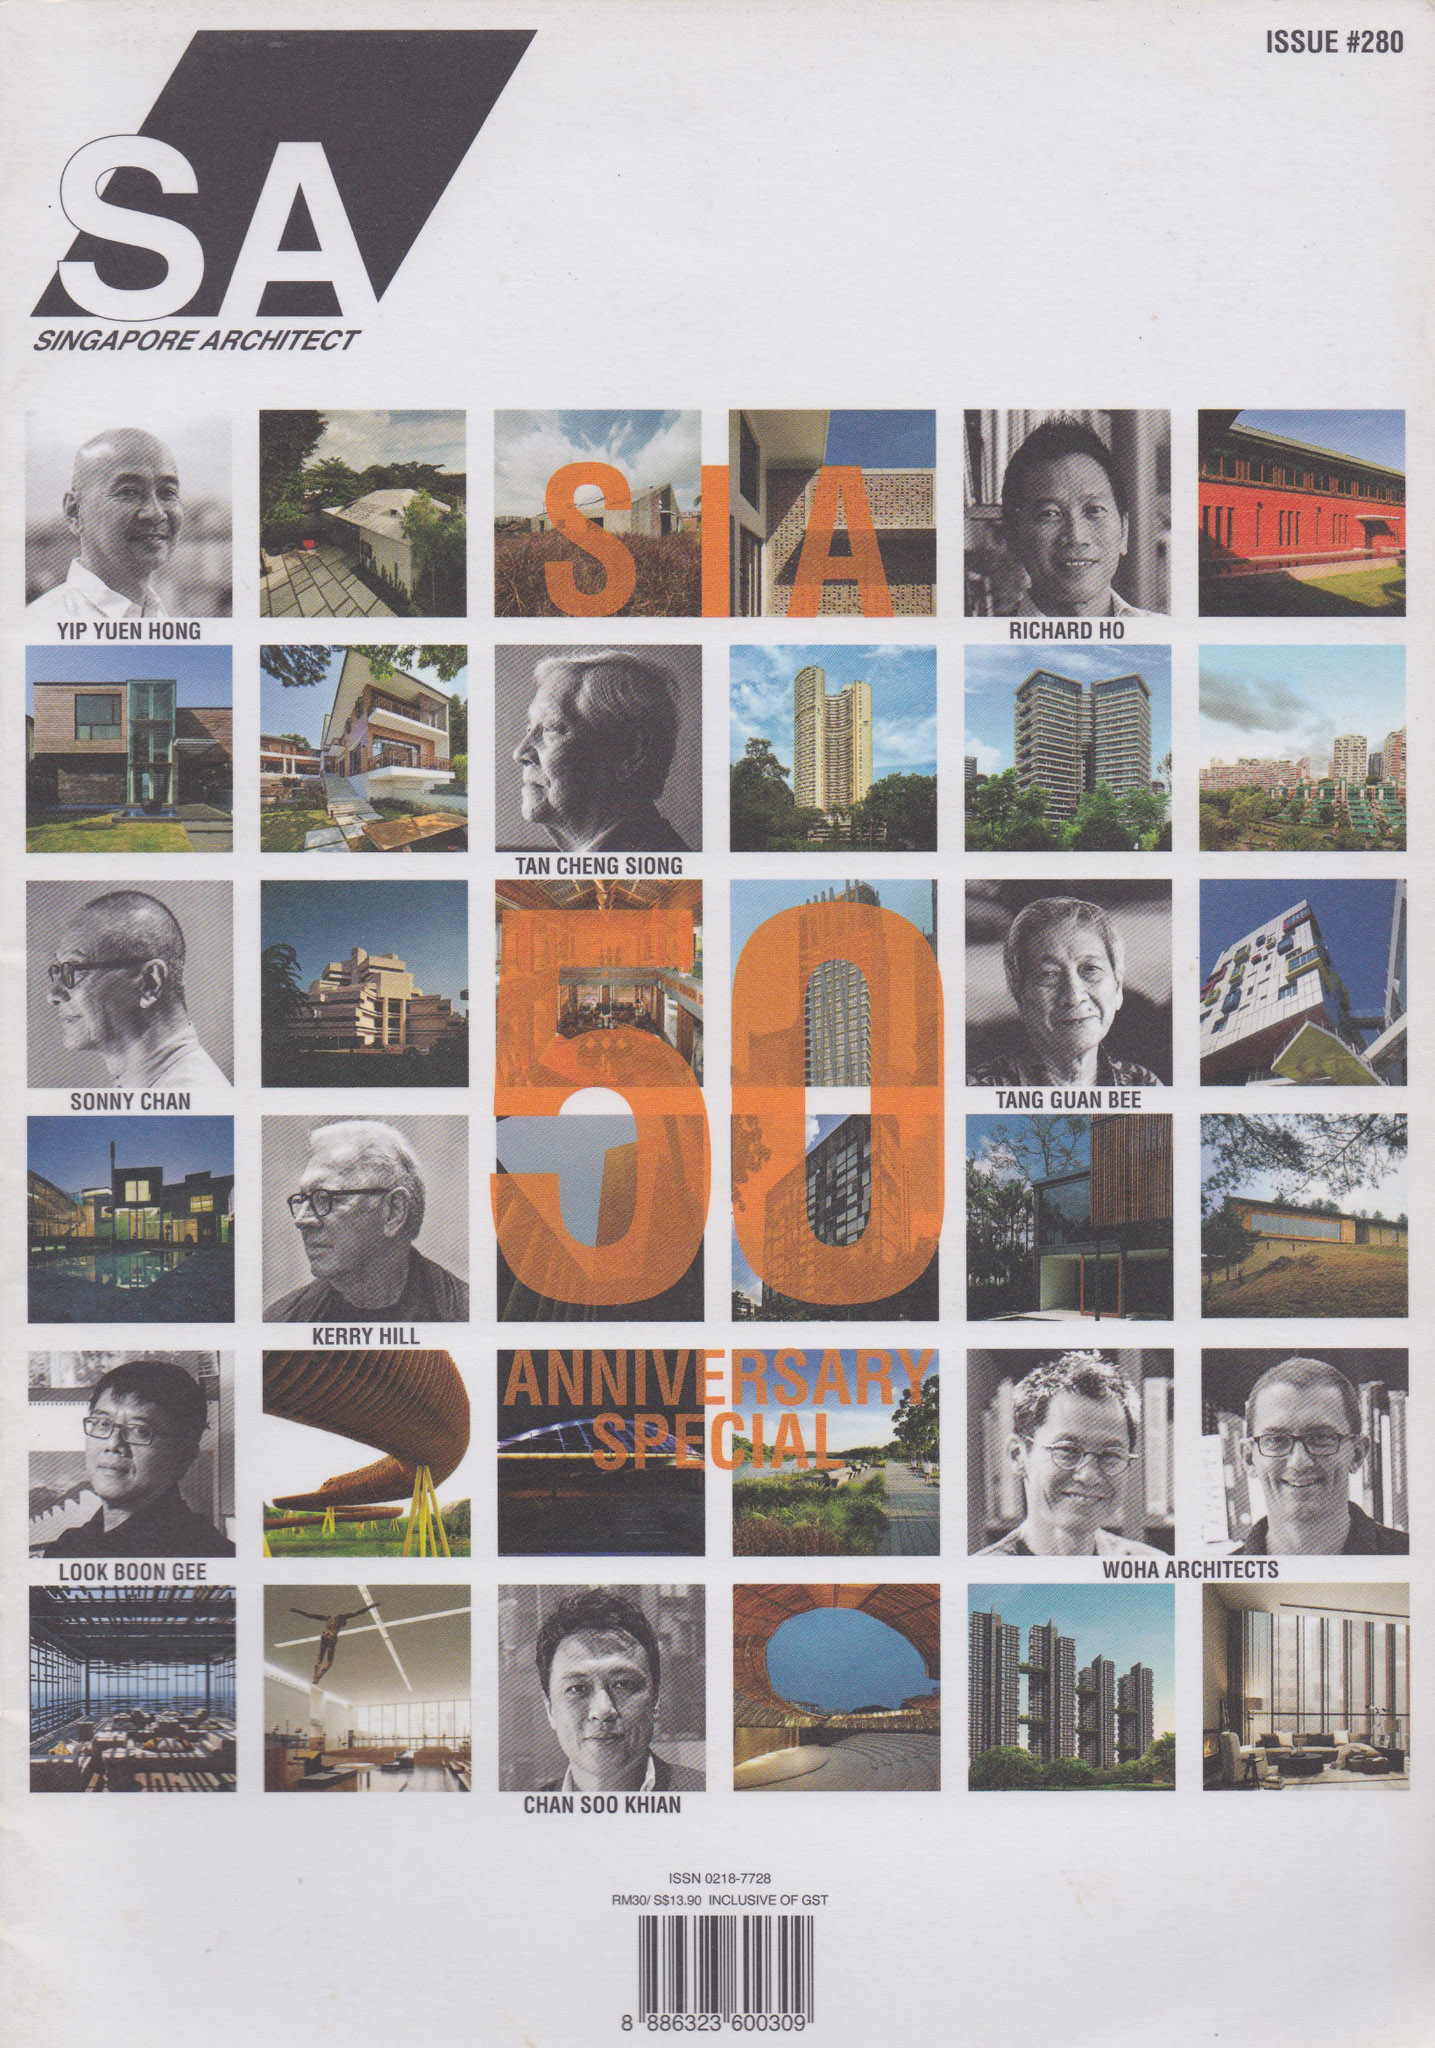 022Singapore-Architect-1-singapore-photographer-editorial-commercial-2_27.jpg